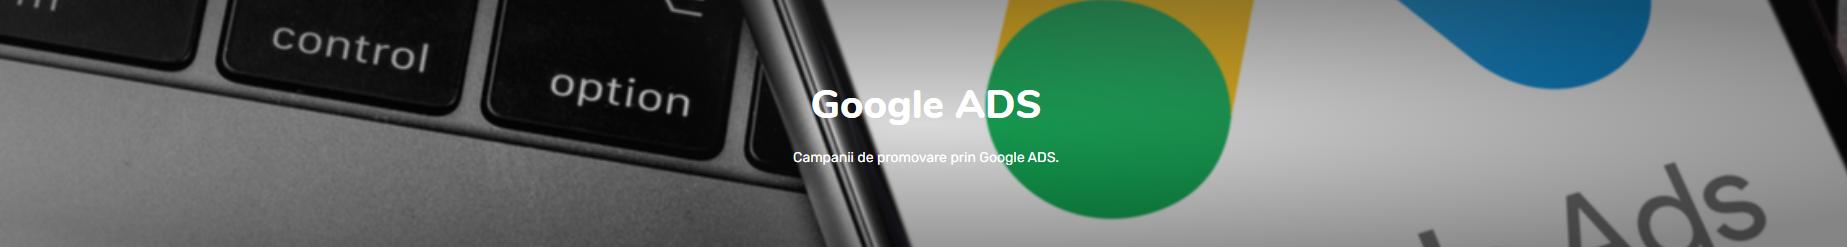 iphone Google ADS Webcept banner